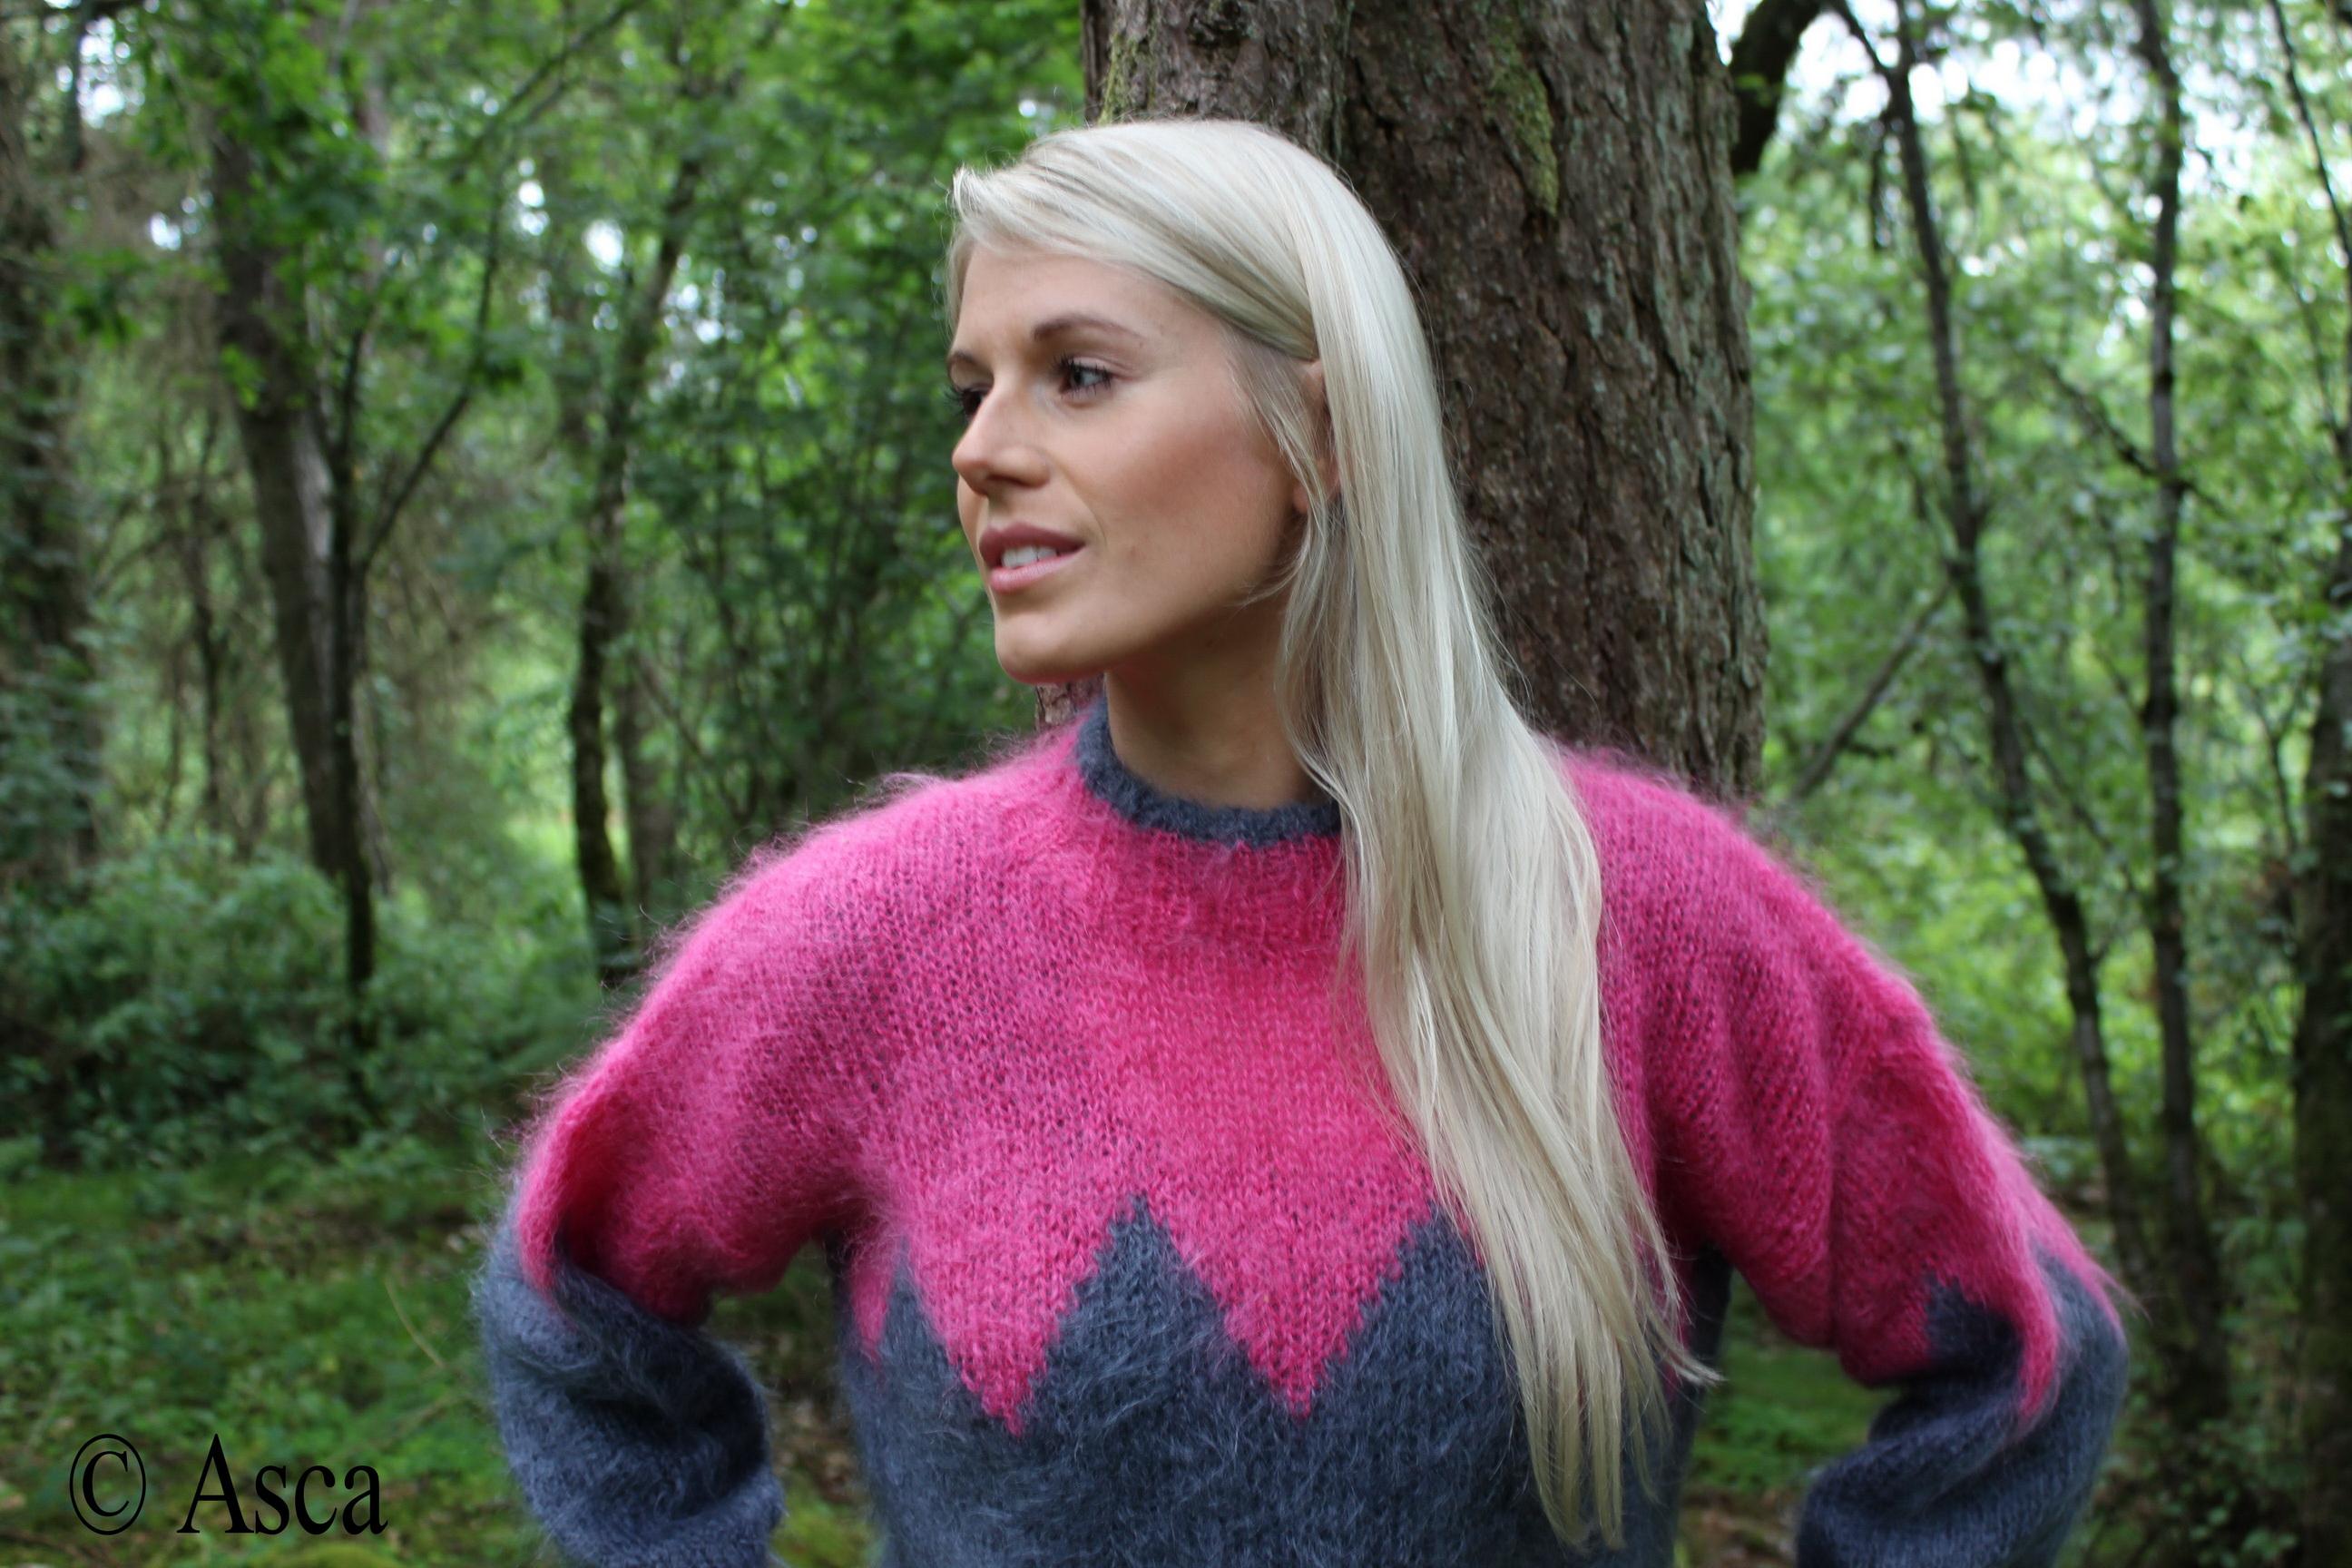 Cut Baby Girl Wallpaper Blonde Sweater Girls